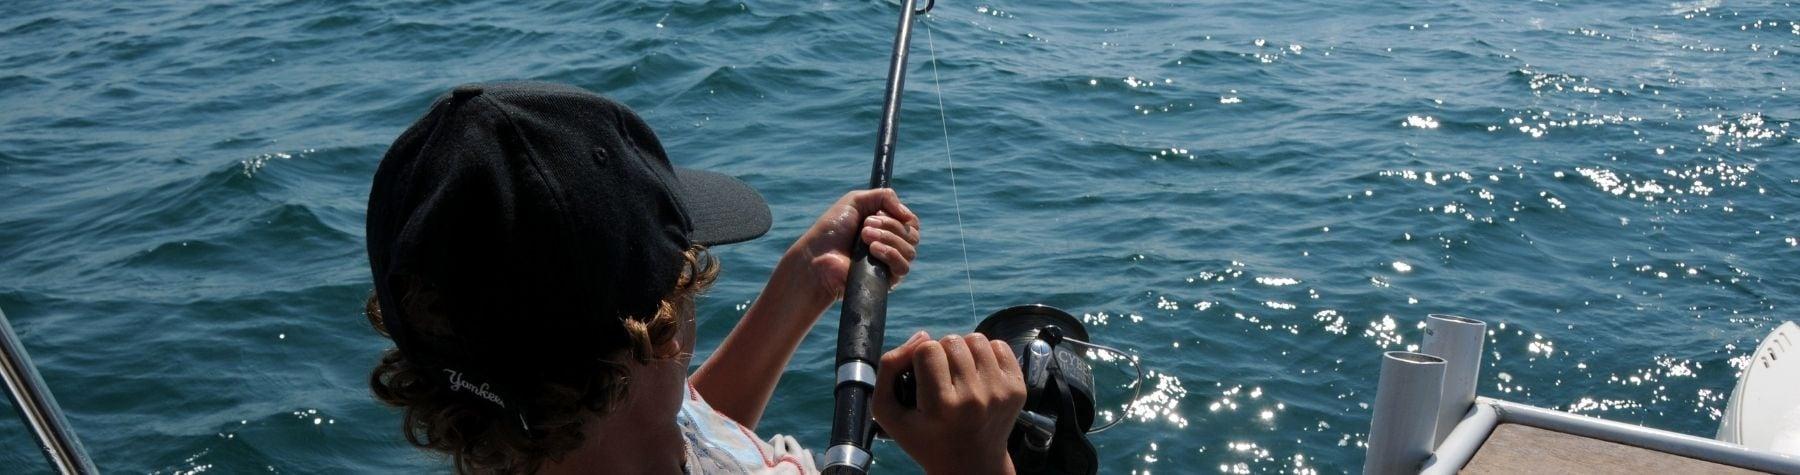 Fishing for the Future in Douglas Shire